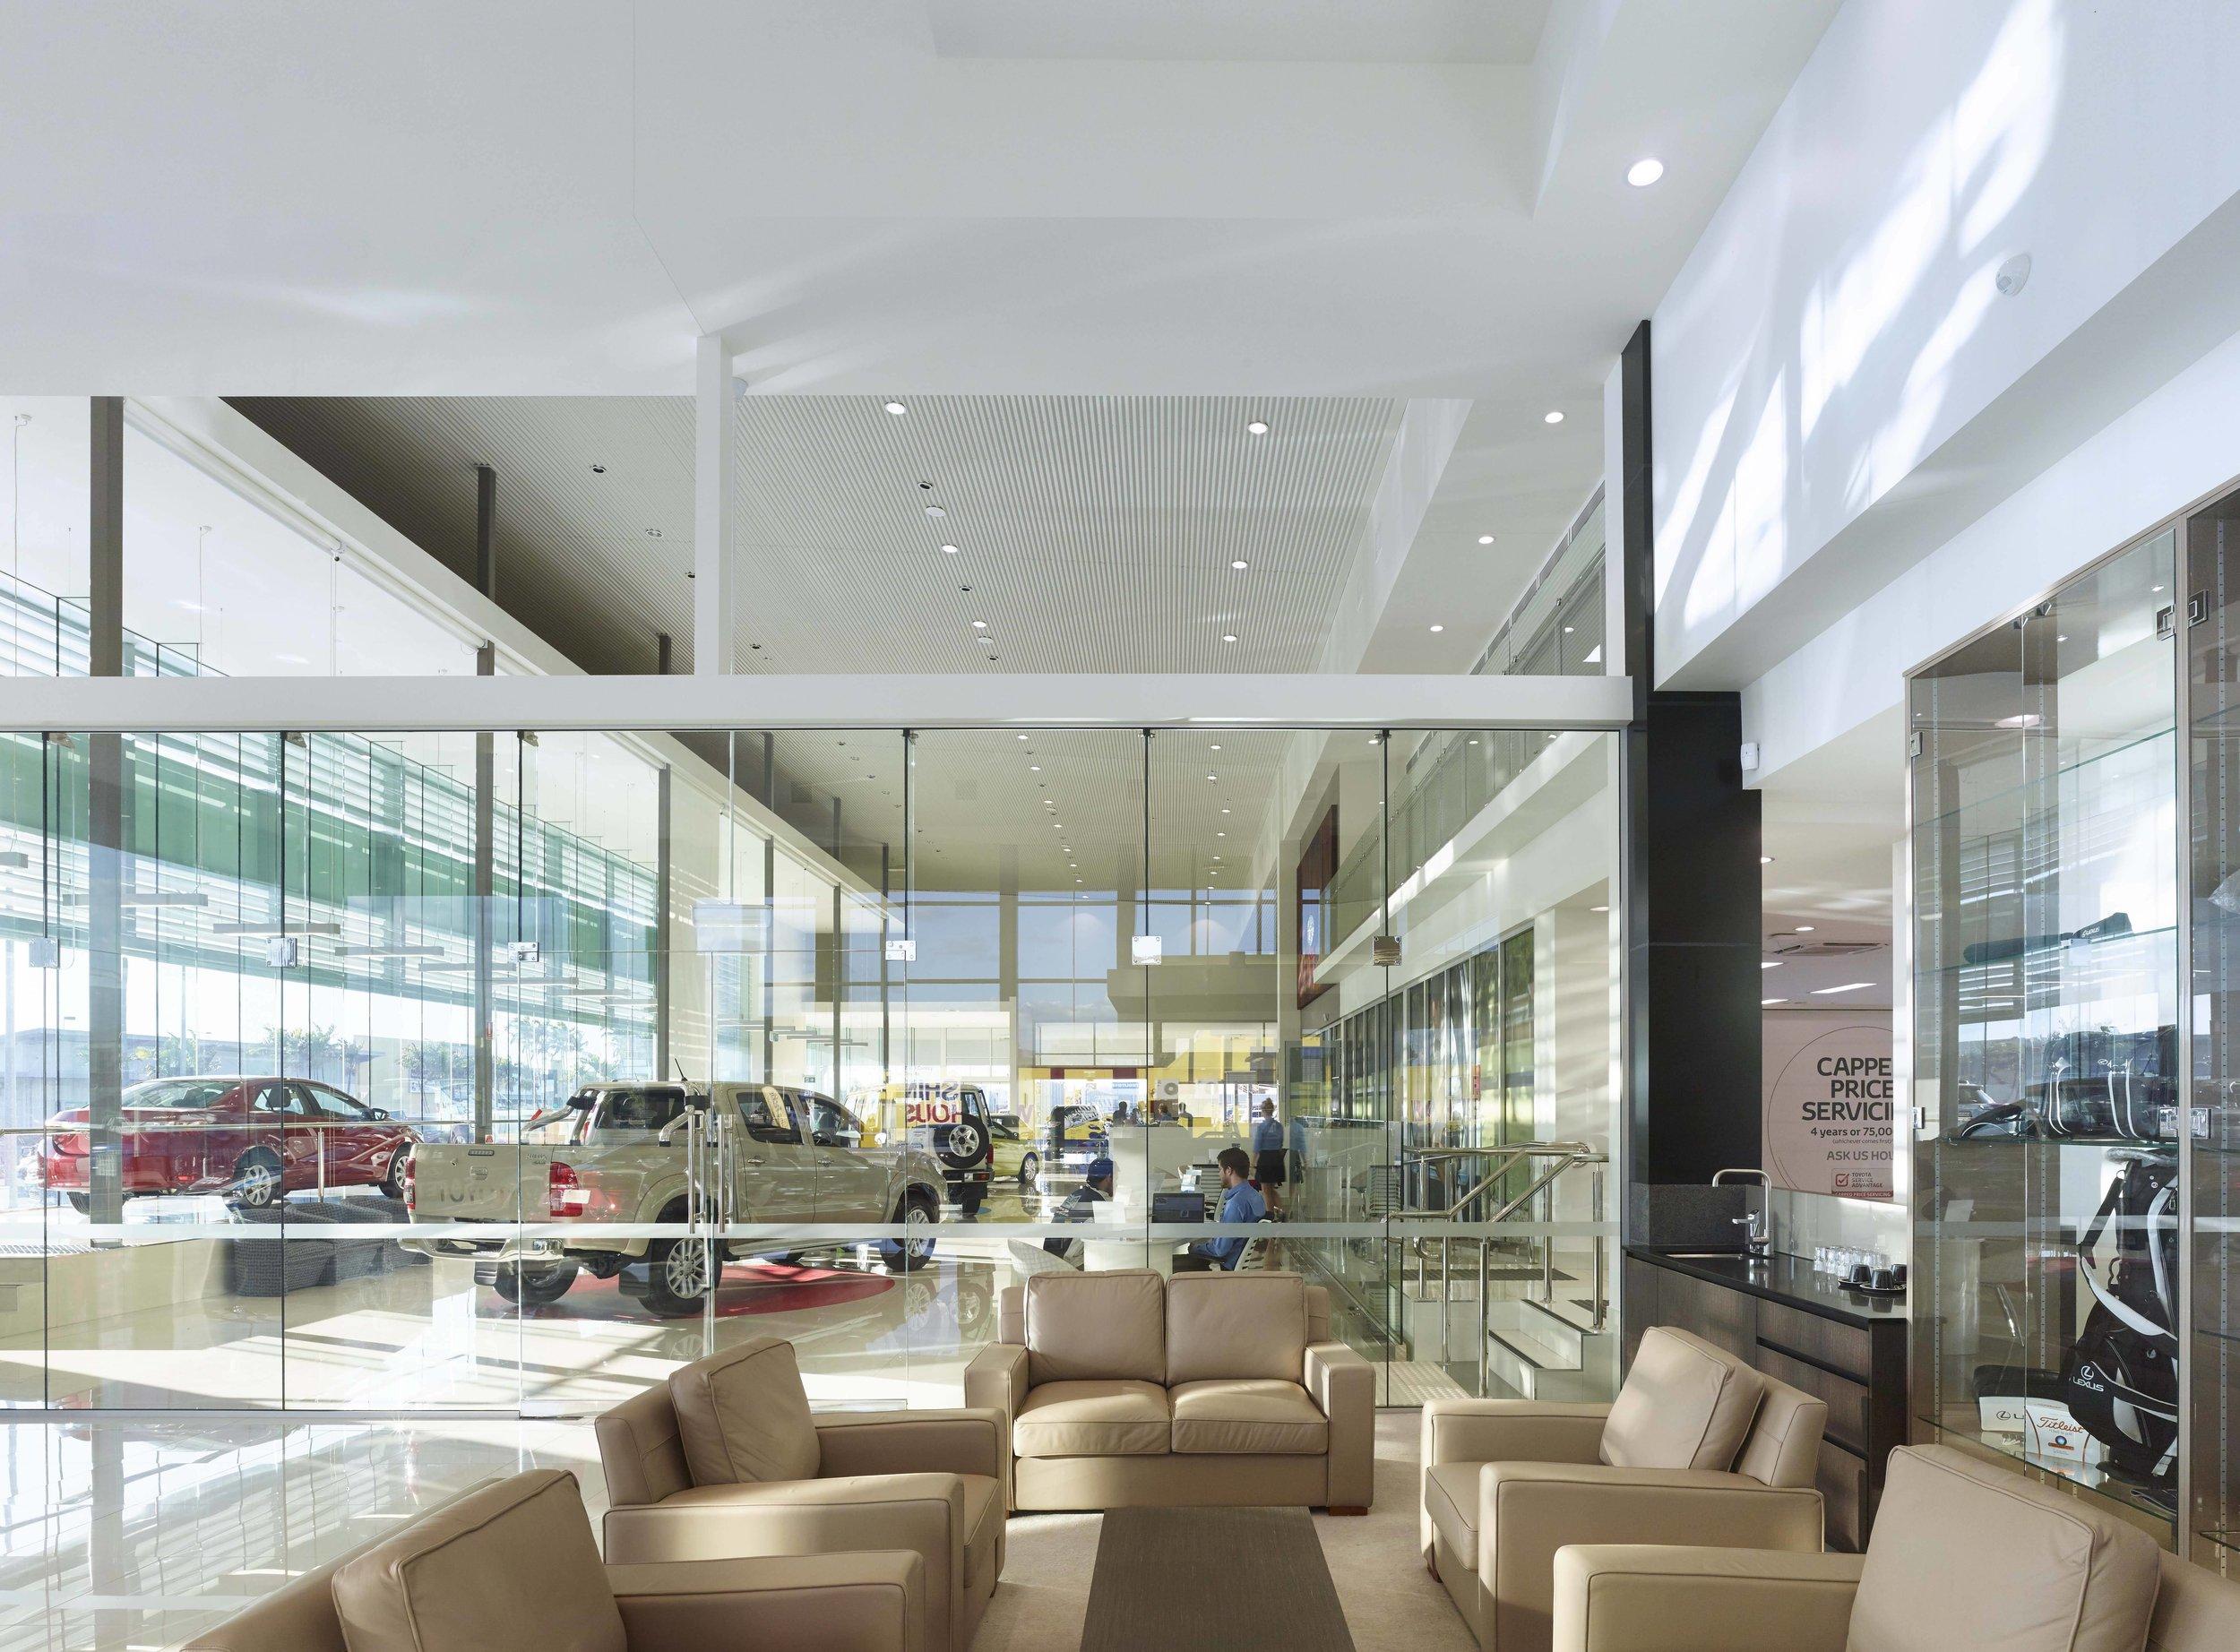 Guymer-bailey-architects-Townsville-Toyota-05.jpg